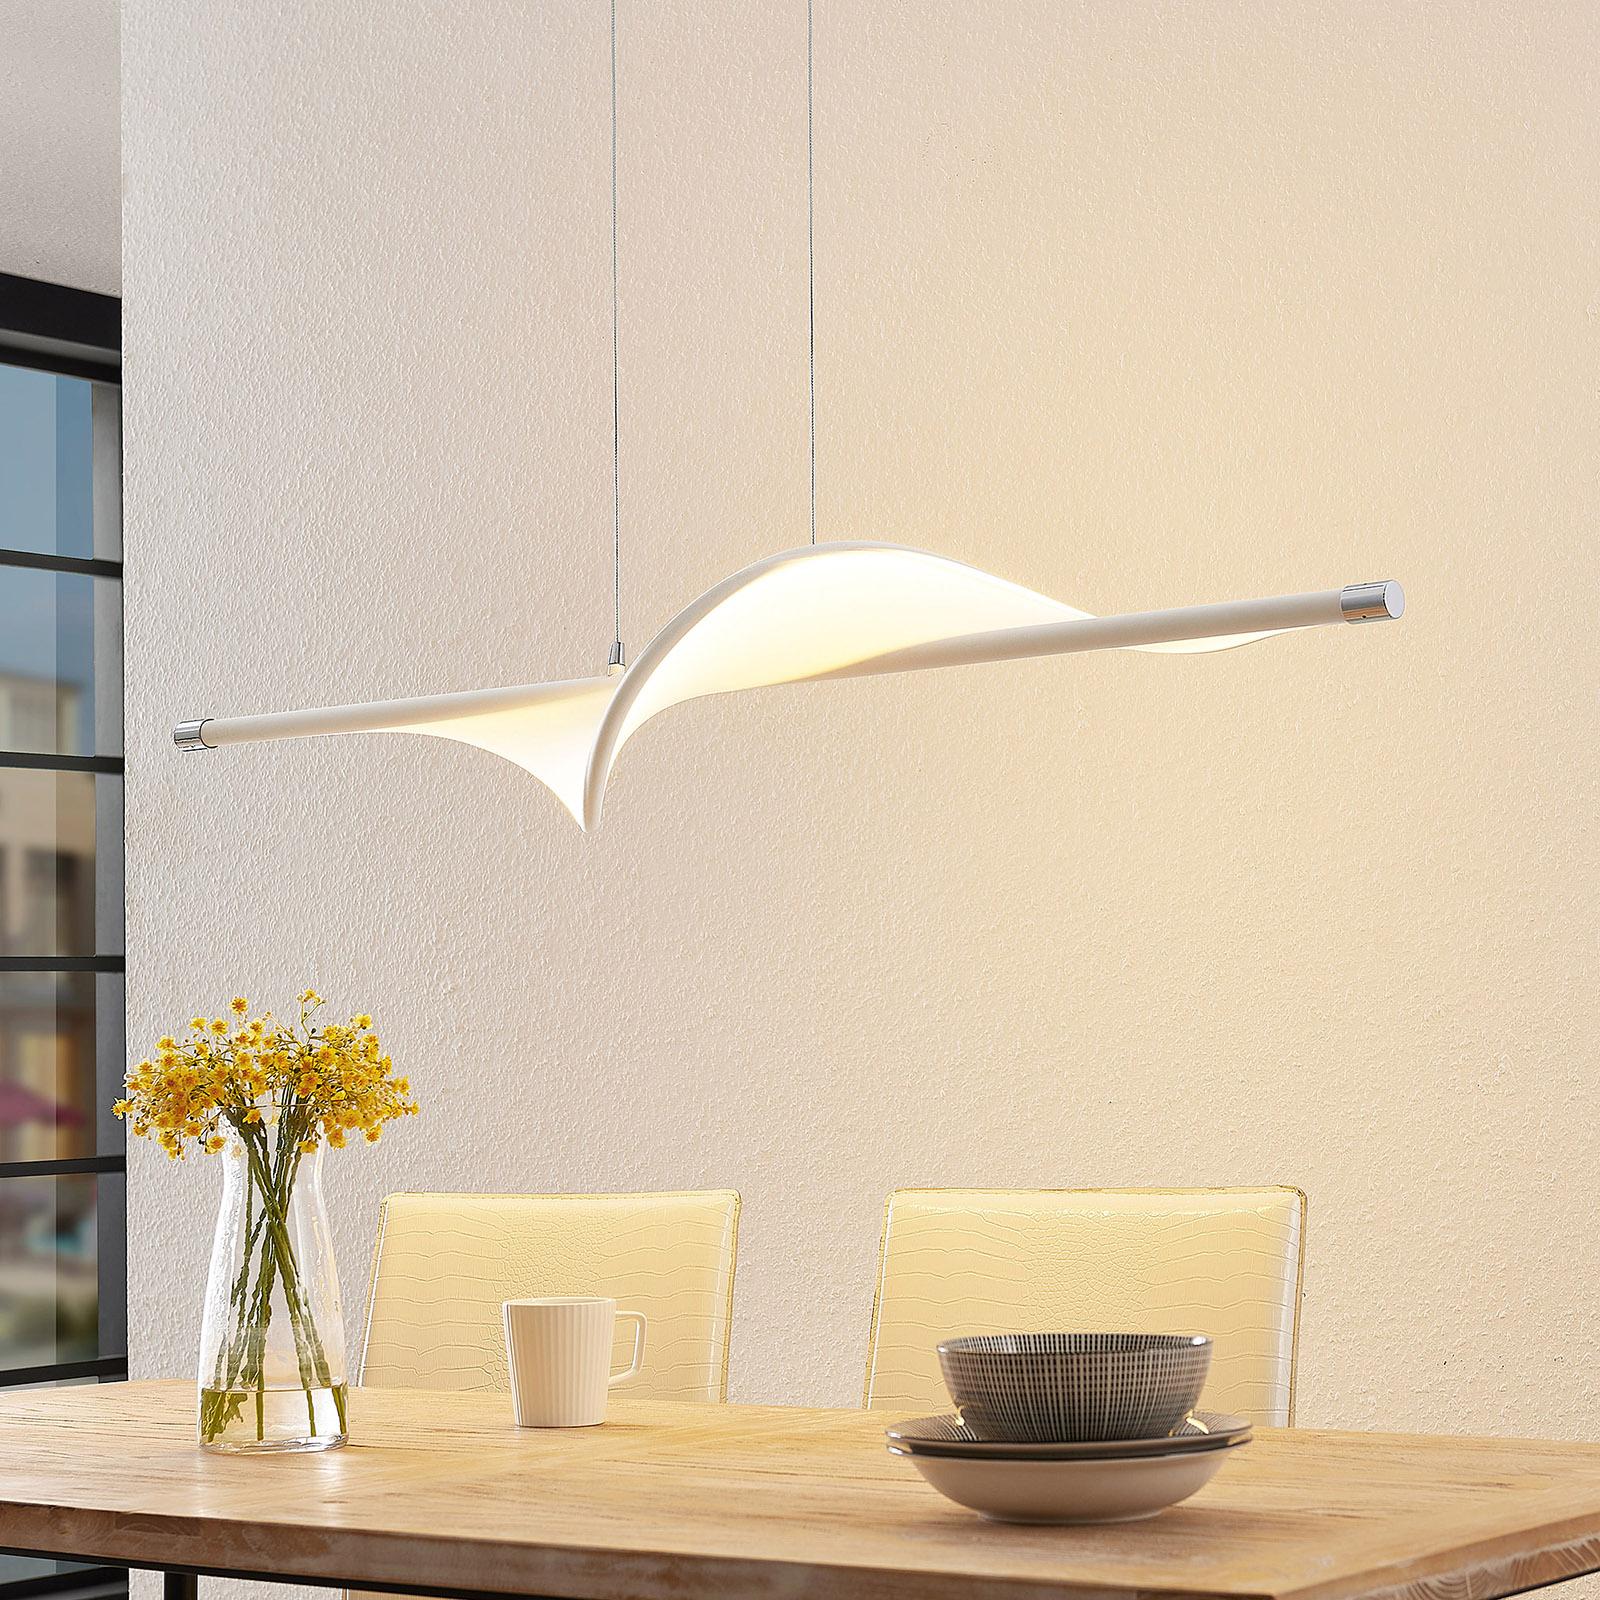 Lucande Edano LED sospensione, luce 3 livelli